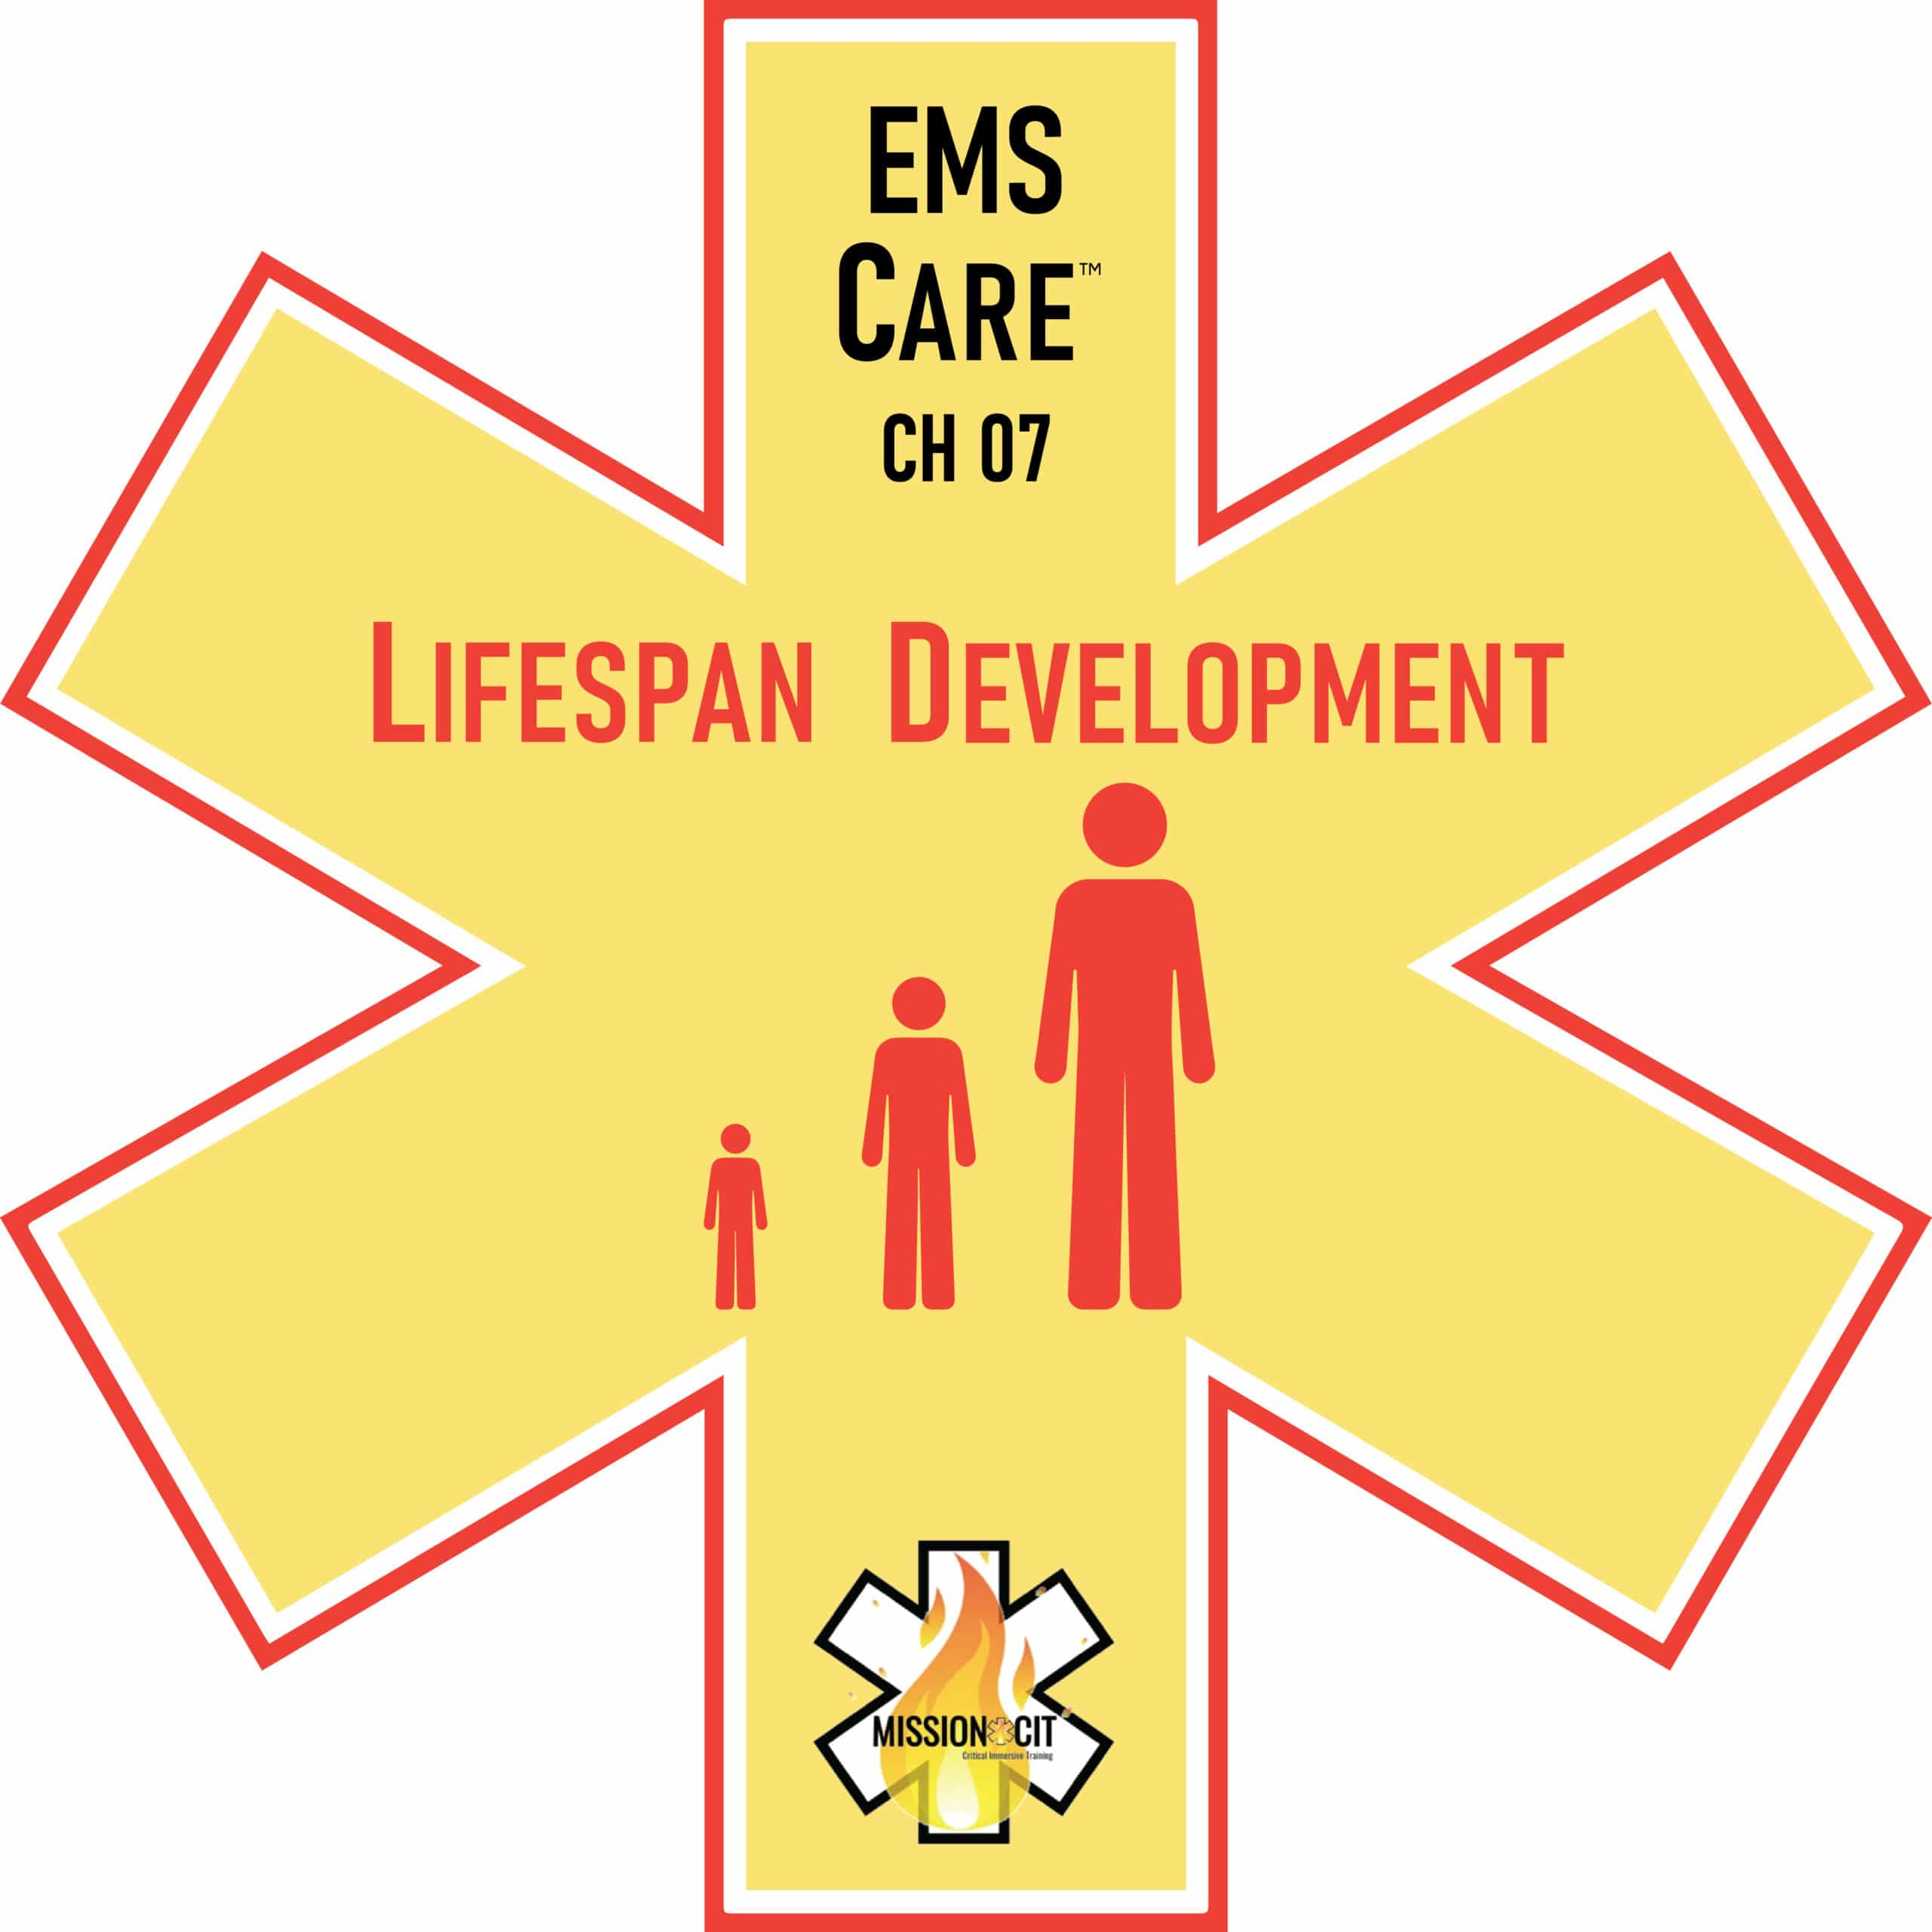 missioncit-ems-care-lifespan-development